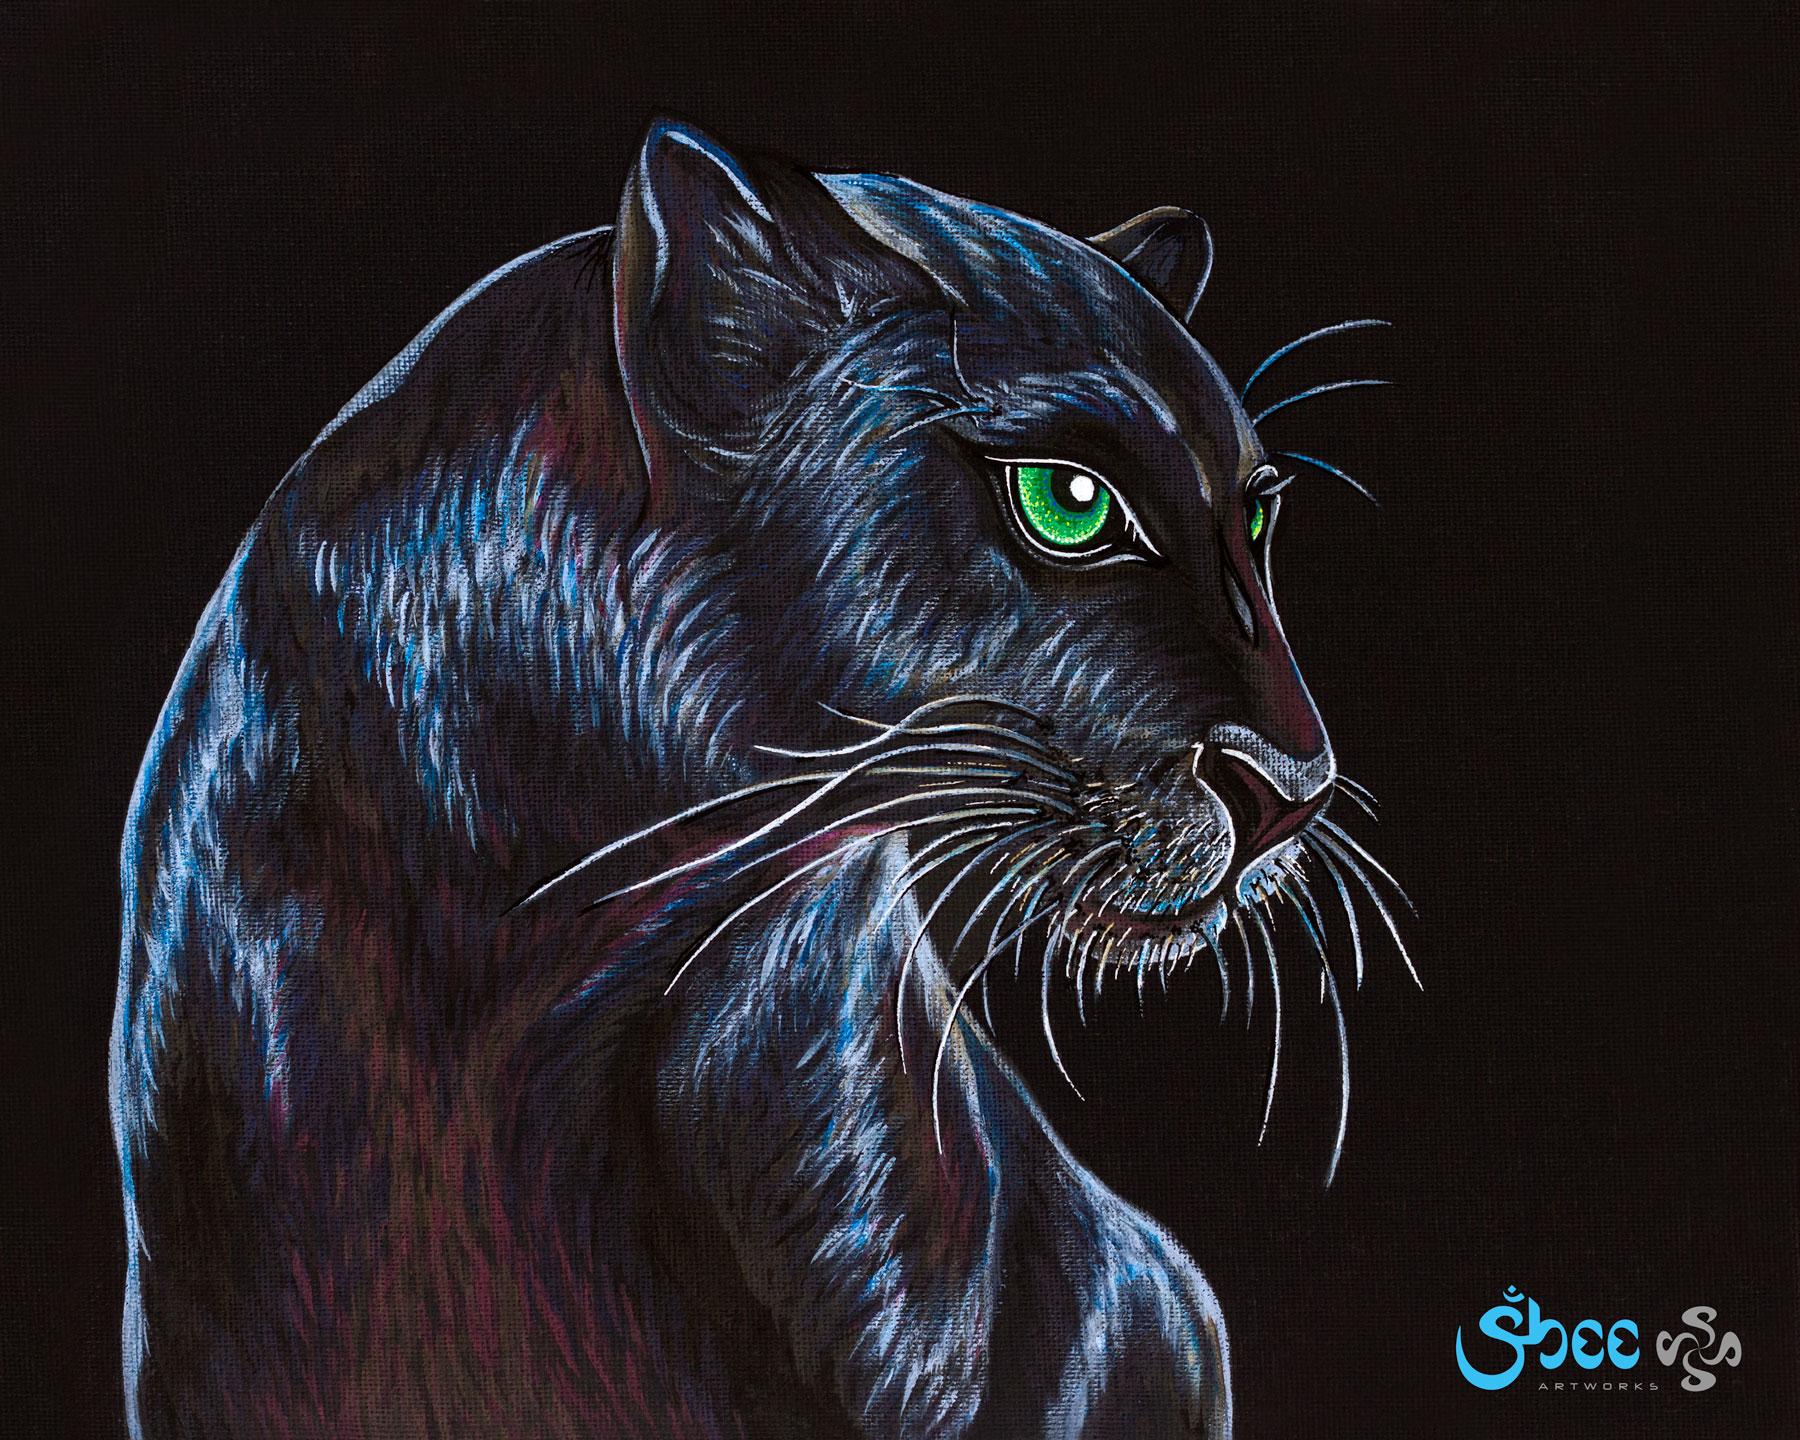 Retro Black Panther - acrylic on canvas - 35 x 28 cm